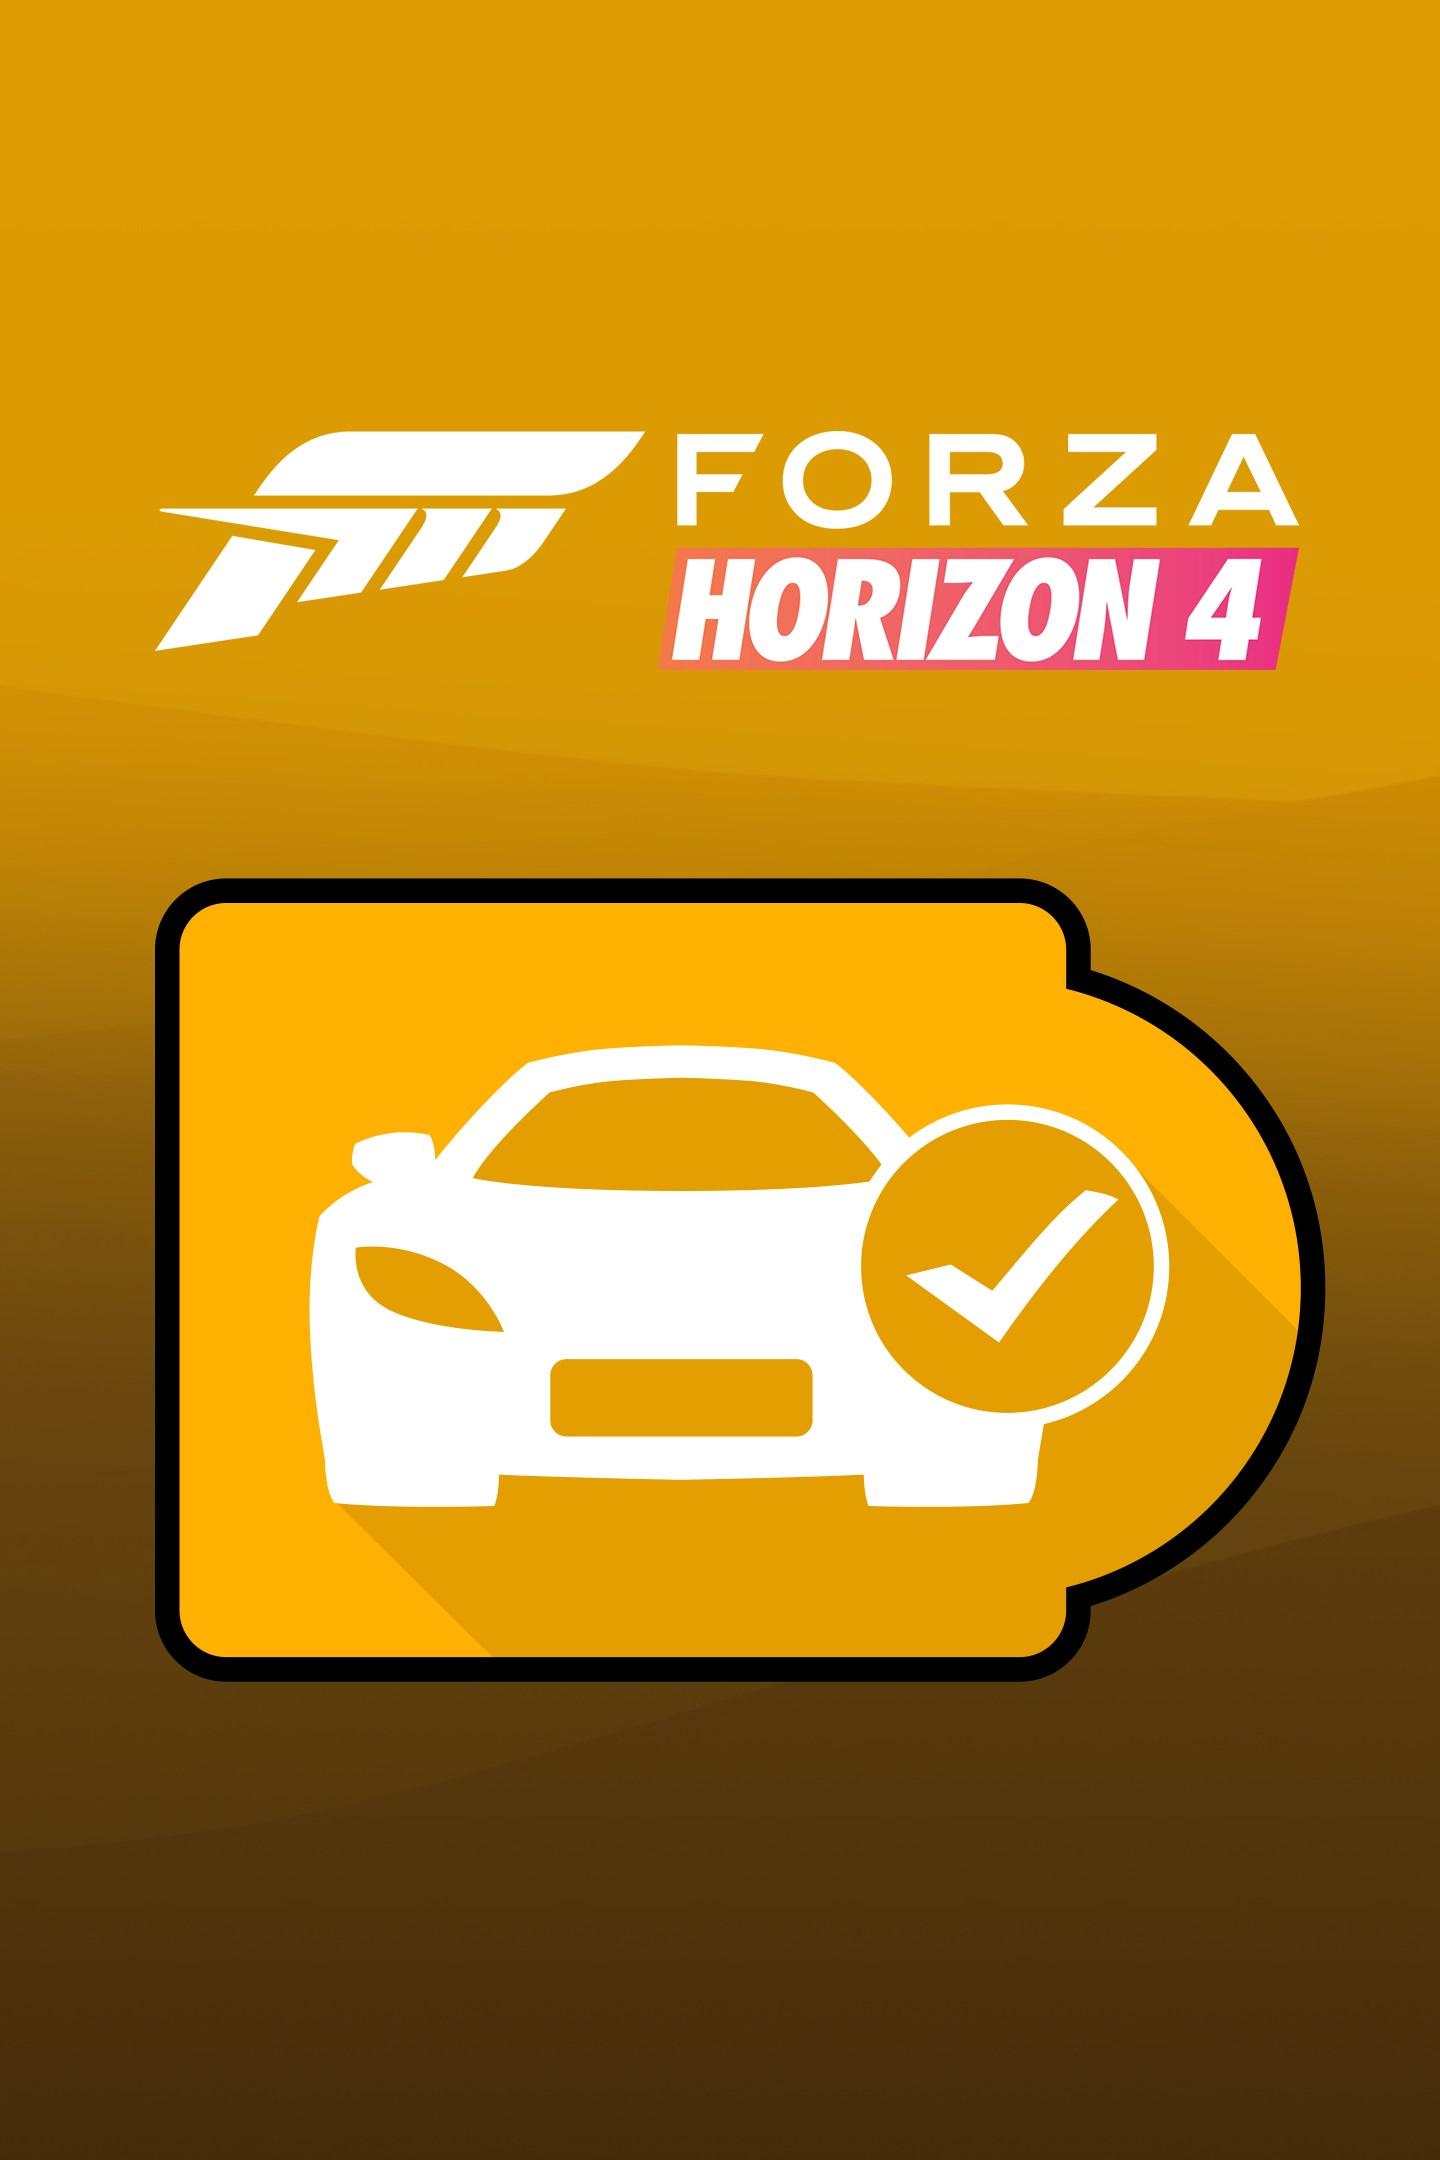 Forza Horizon 4/Car Pass | Forza Motorsport Wiki | FANDOM powered by